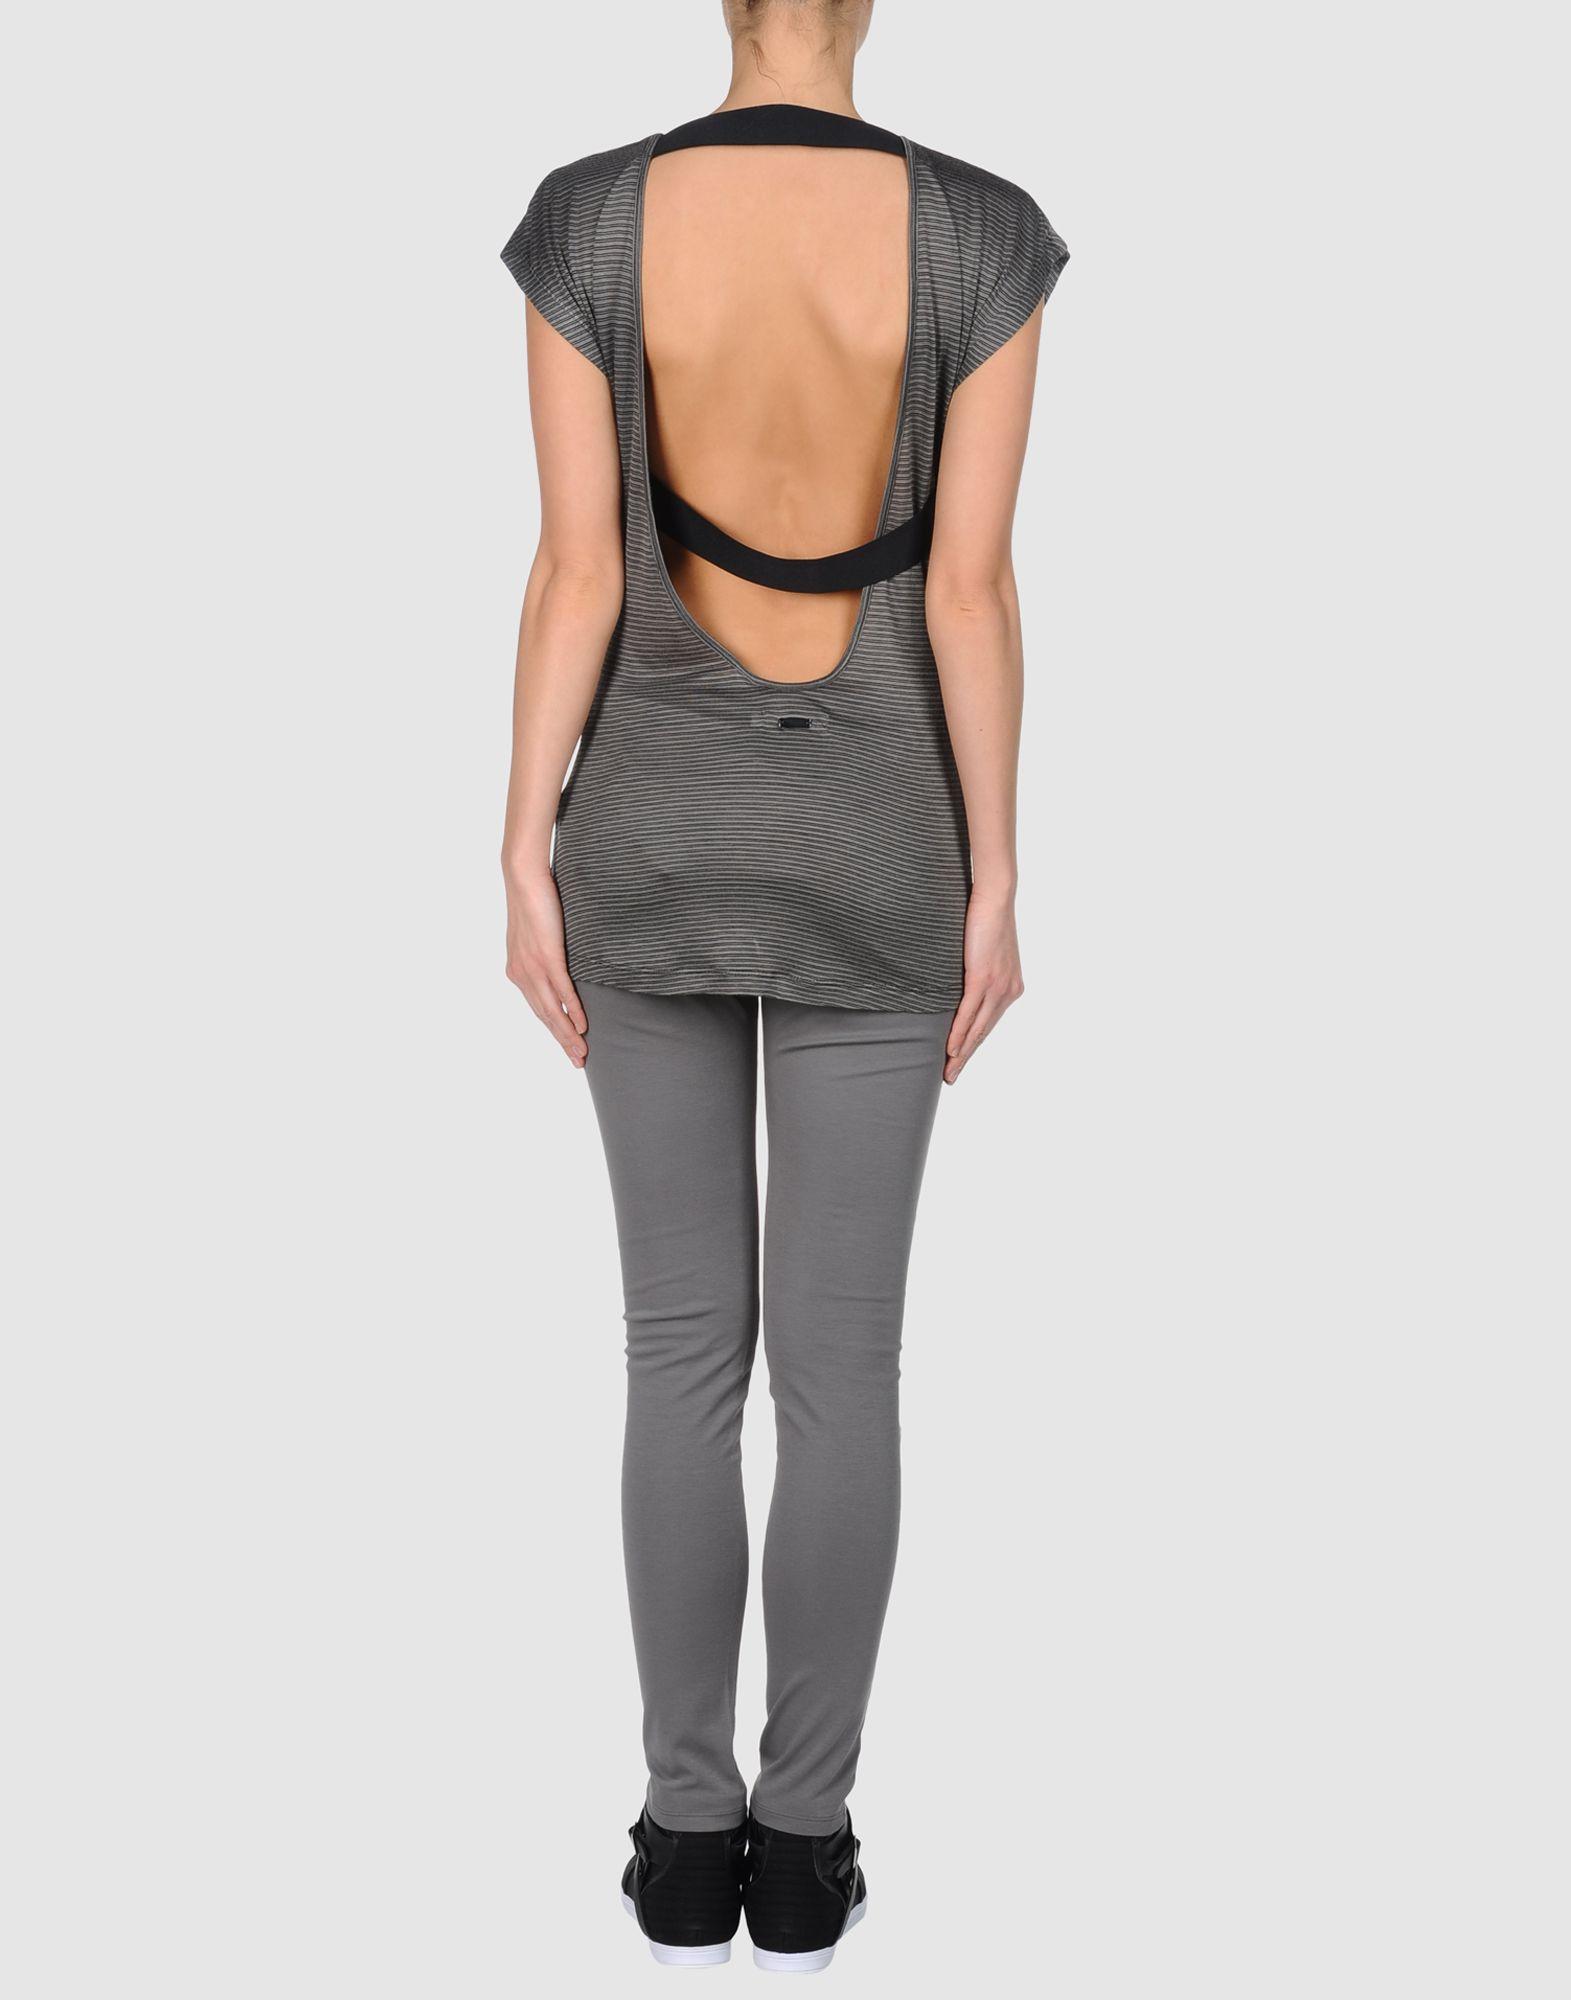 adidas slvr leggings in gray lyst. Black Bedroom Furniture Sets. Home Design Ideas